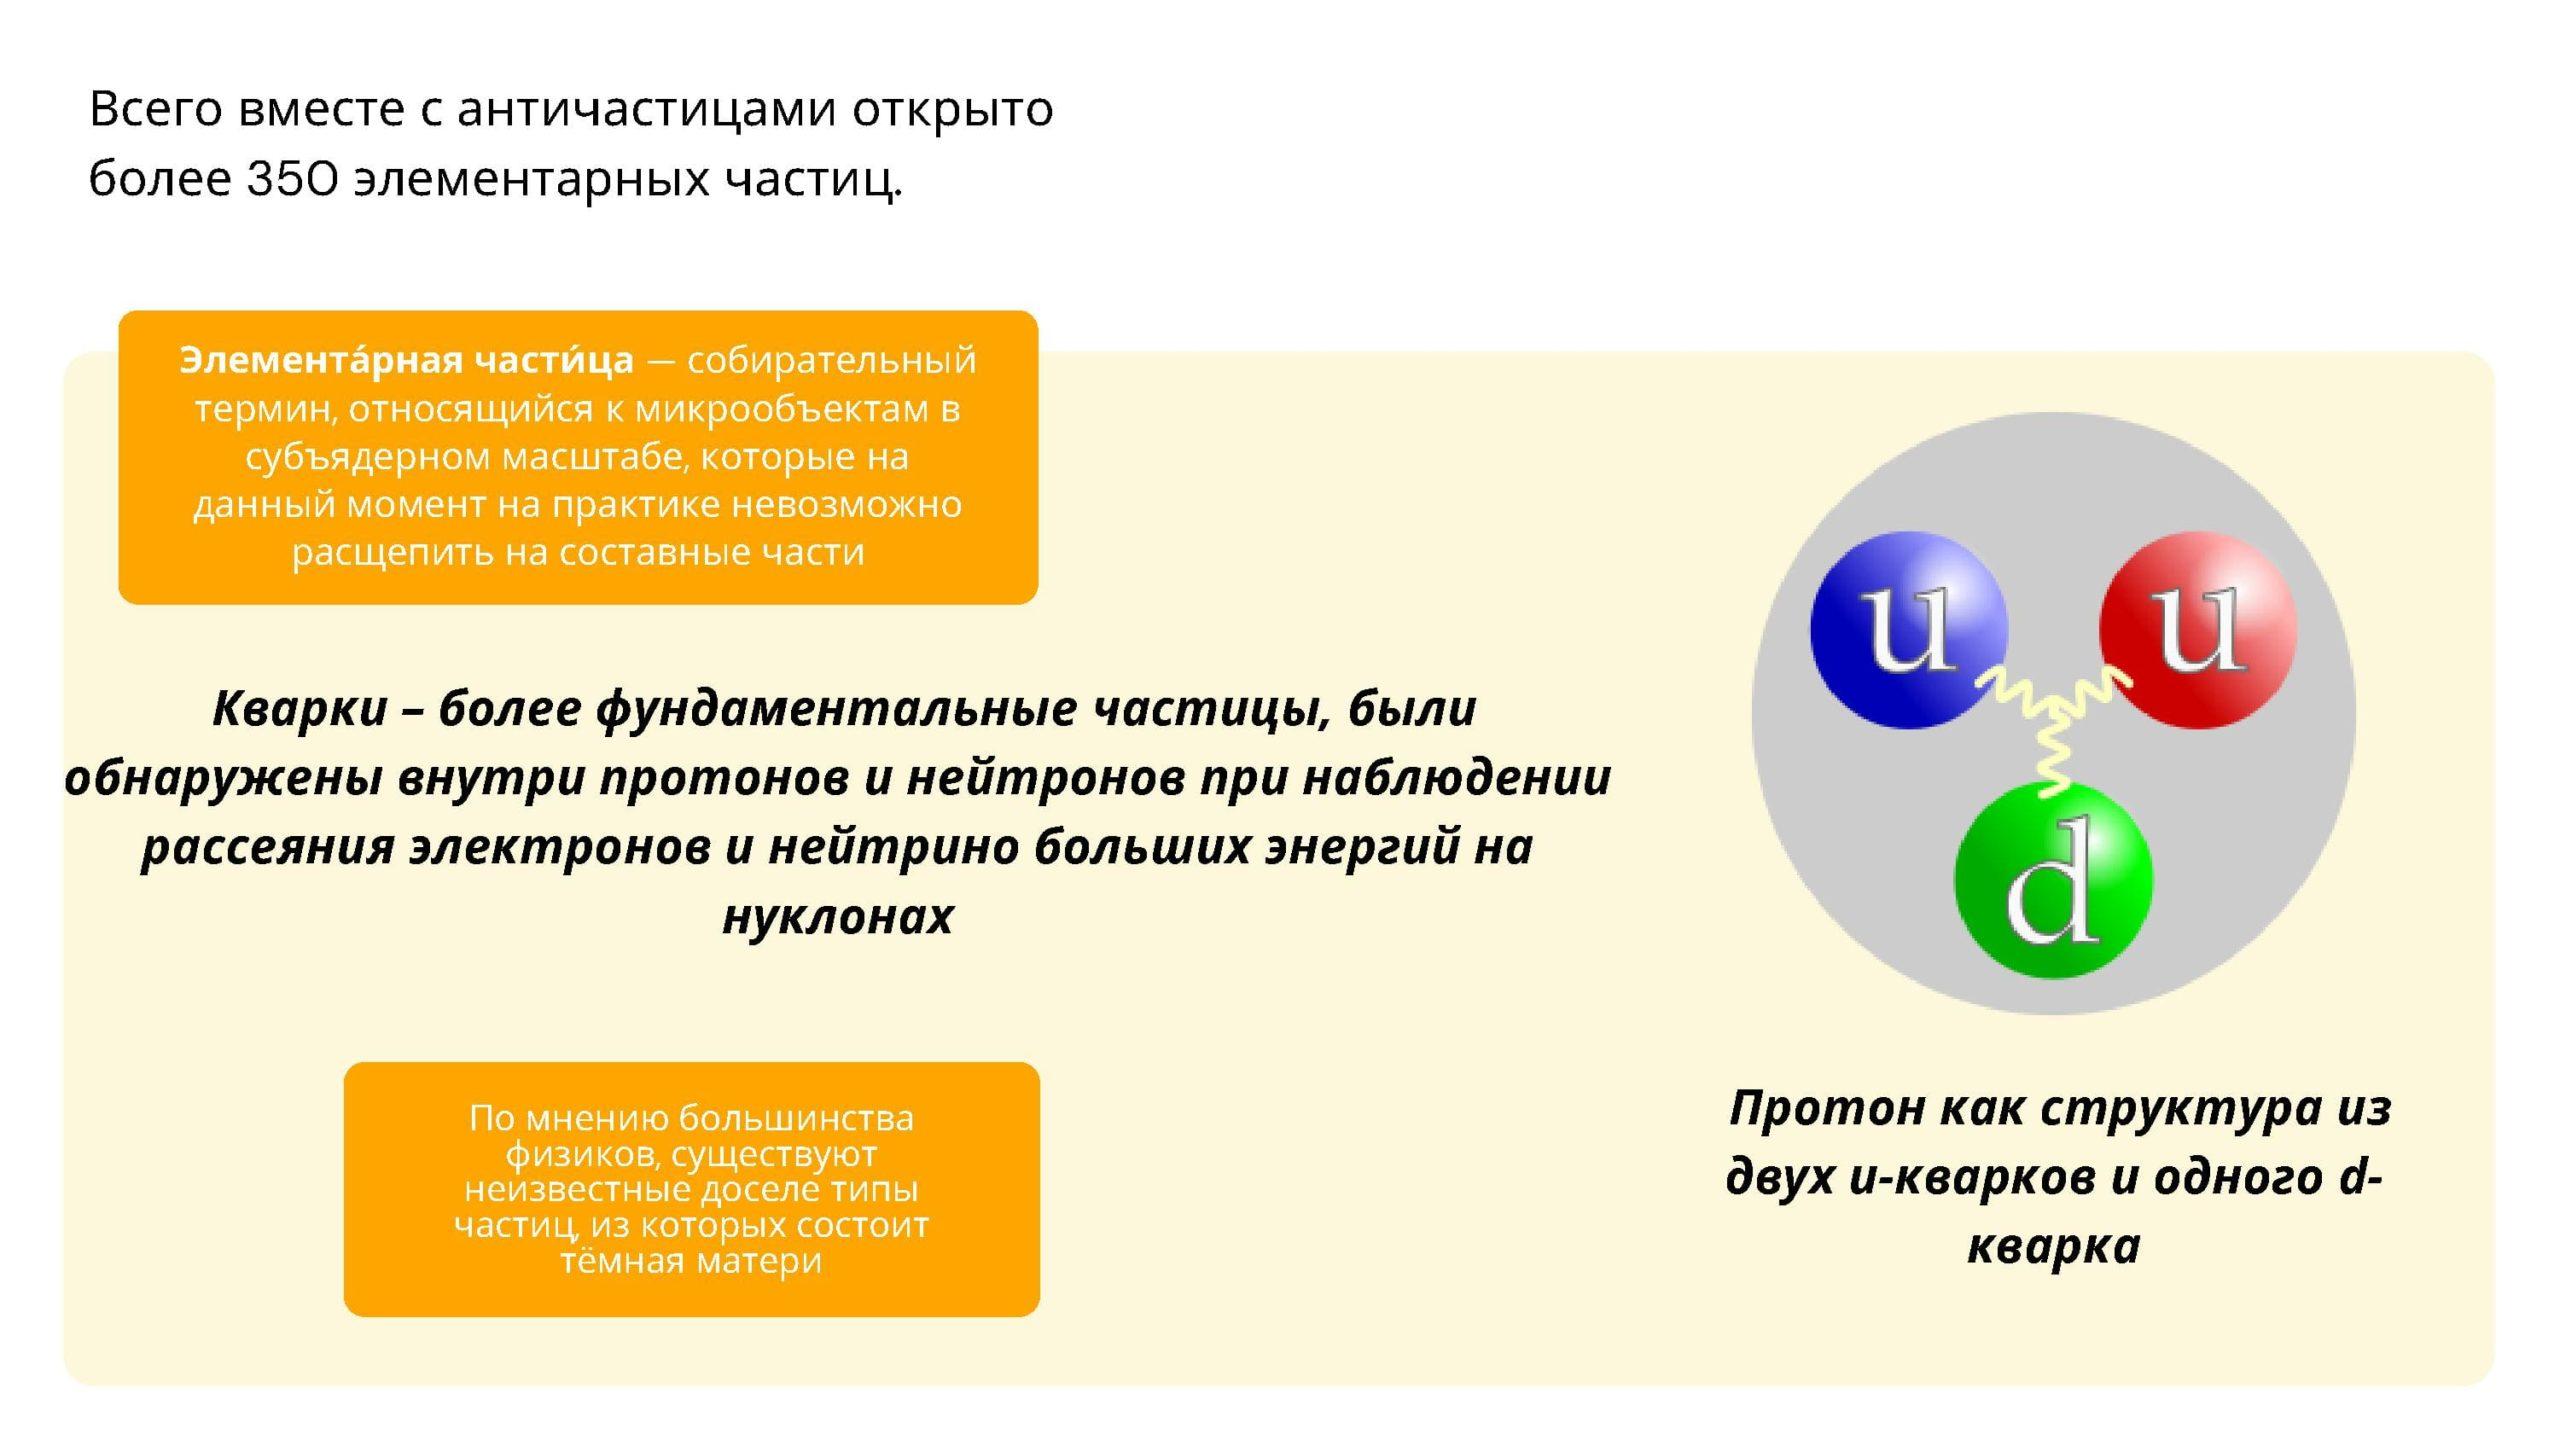 Протон как структура из двух